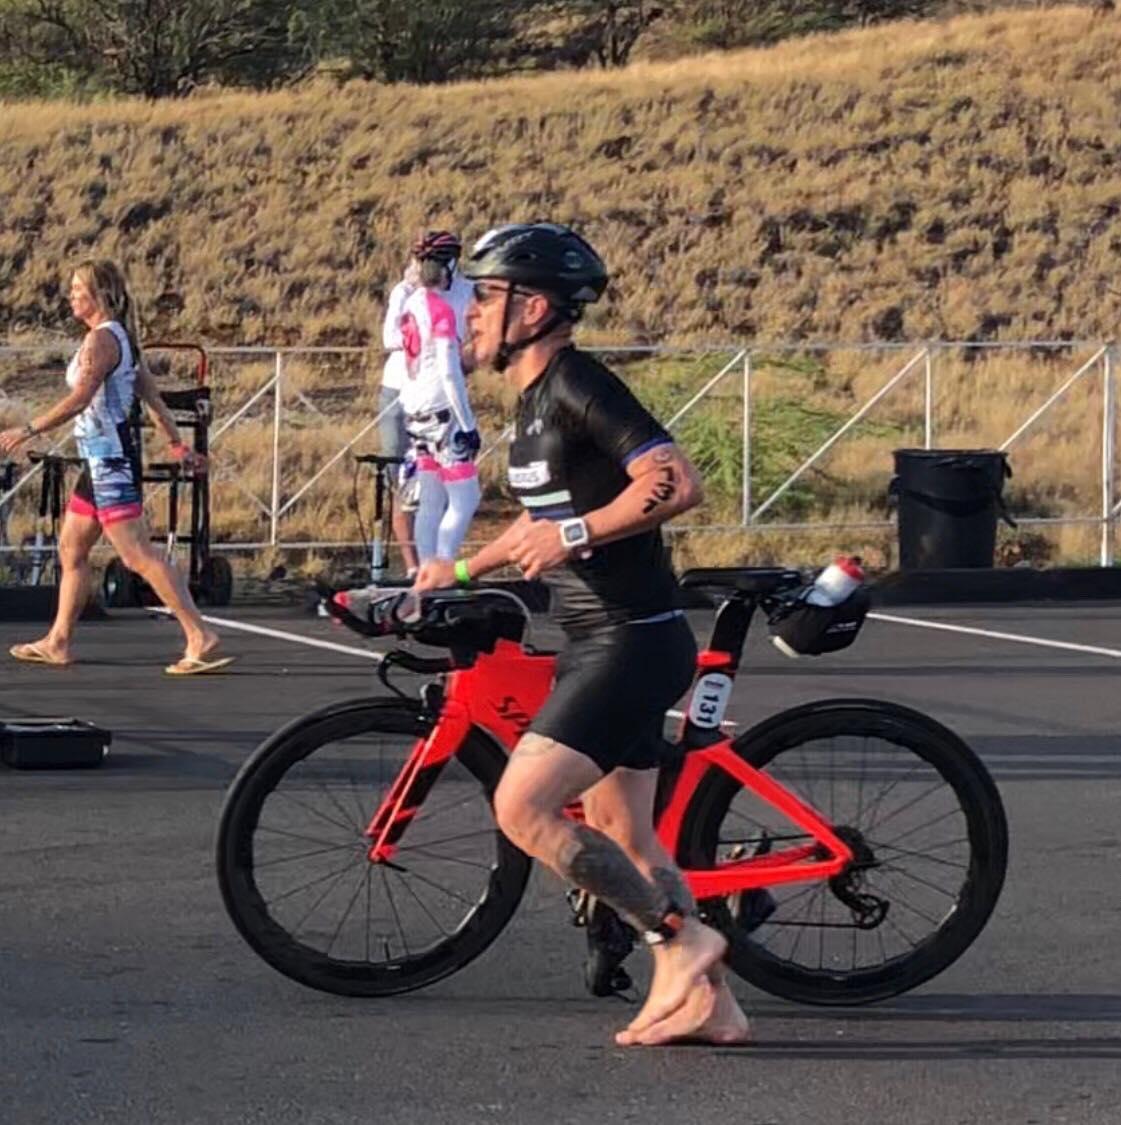 Coach_Terry_Wilson_Matt_Vella_Ironman_Hawaii_70.3_Bike.jpg